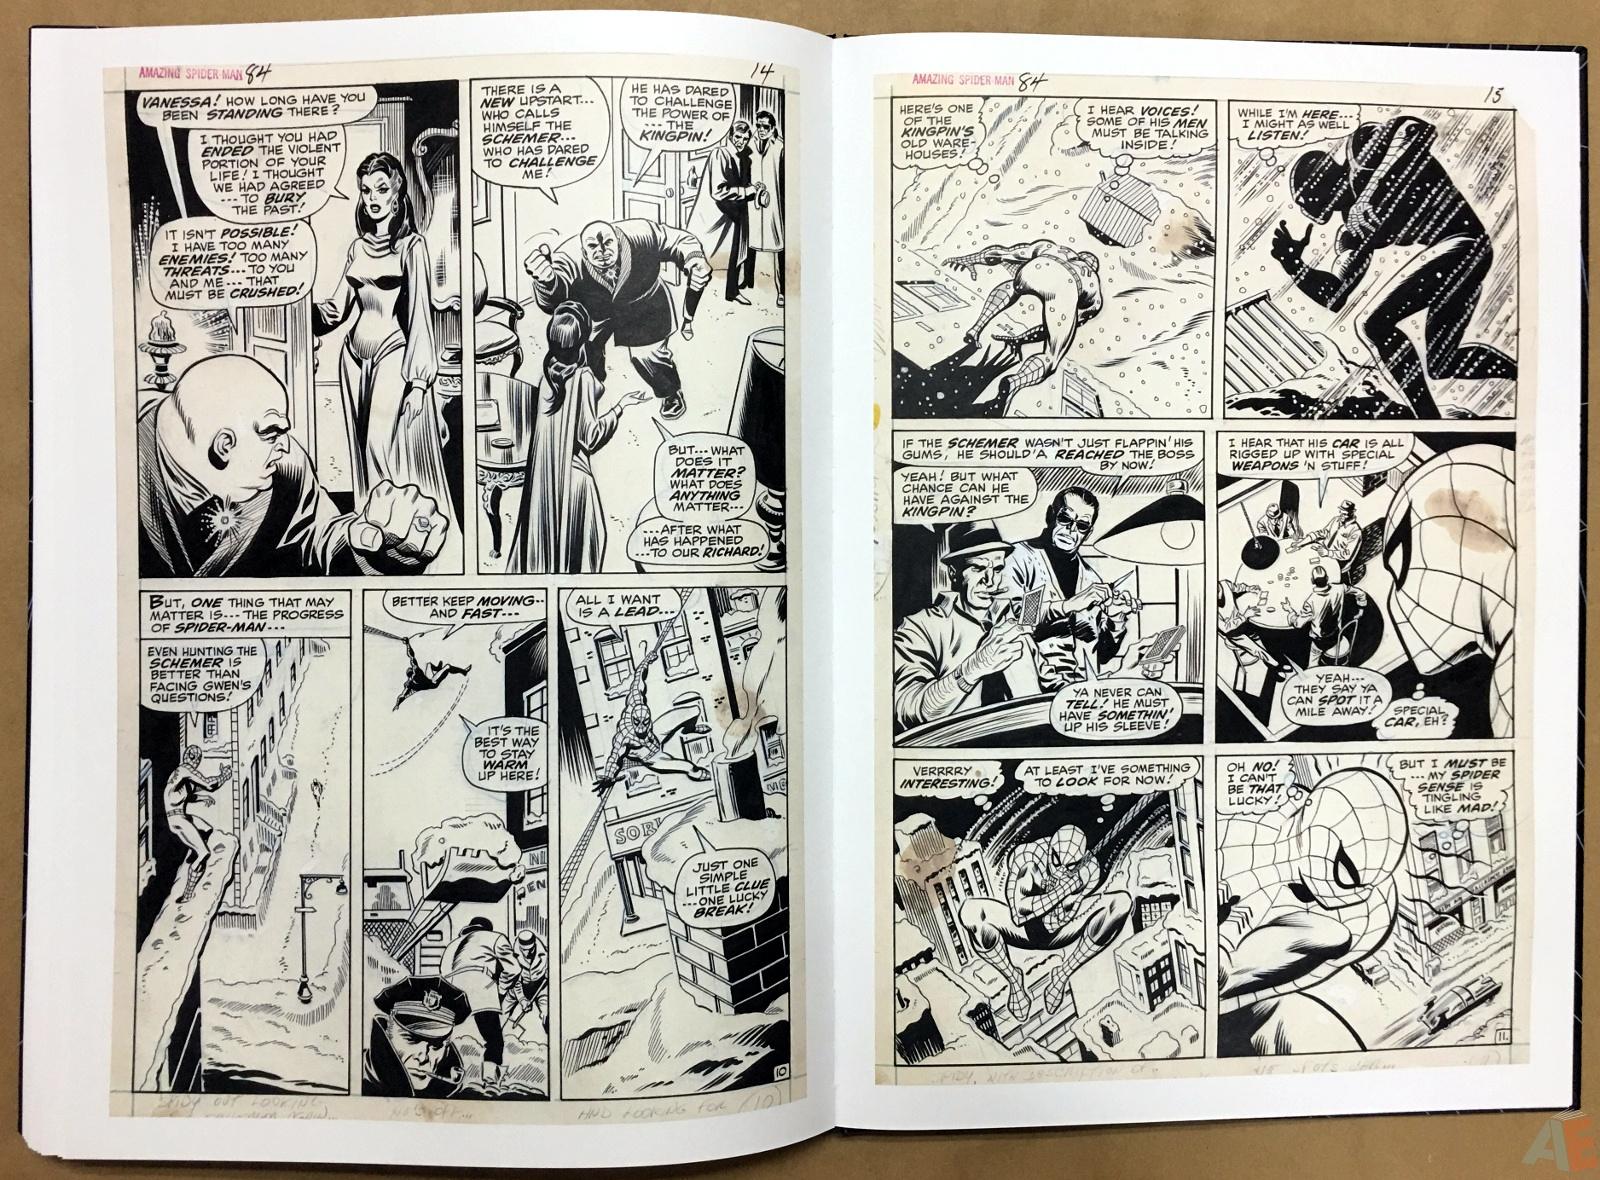 John Romita's The Amazing Spider-Man Artist's Edition 48